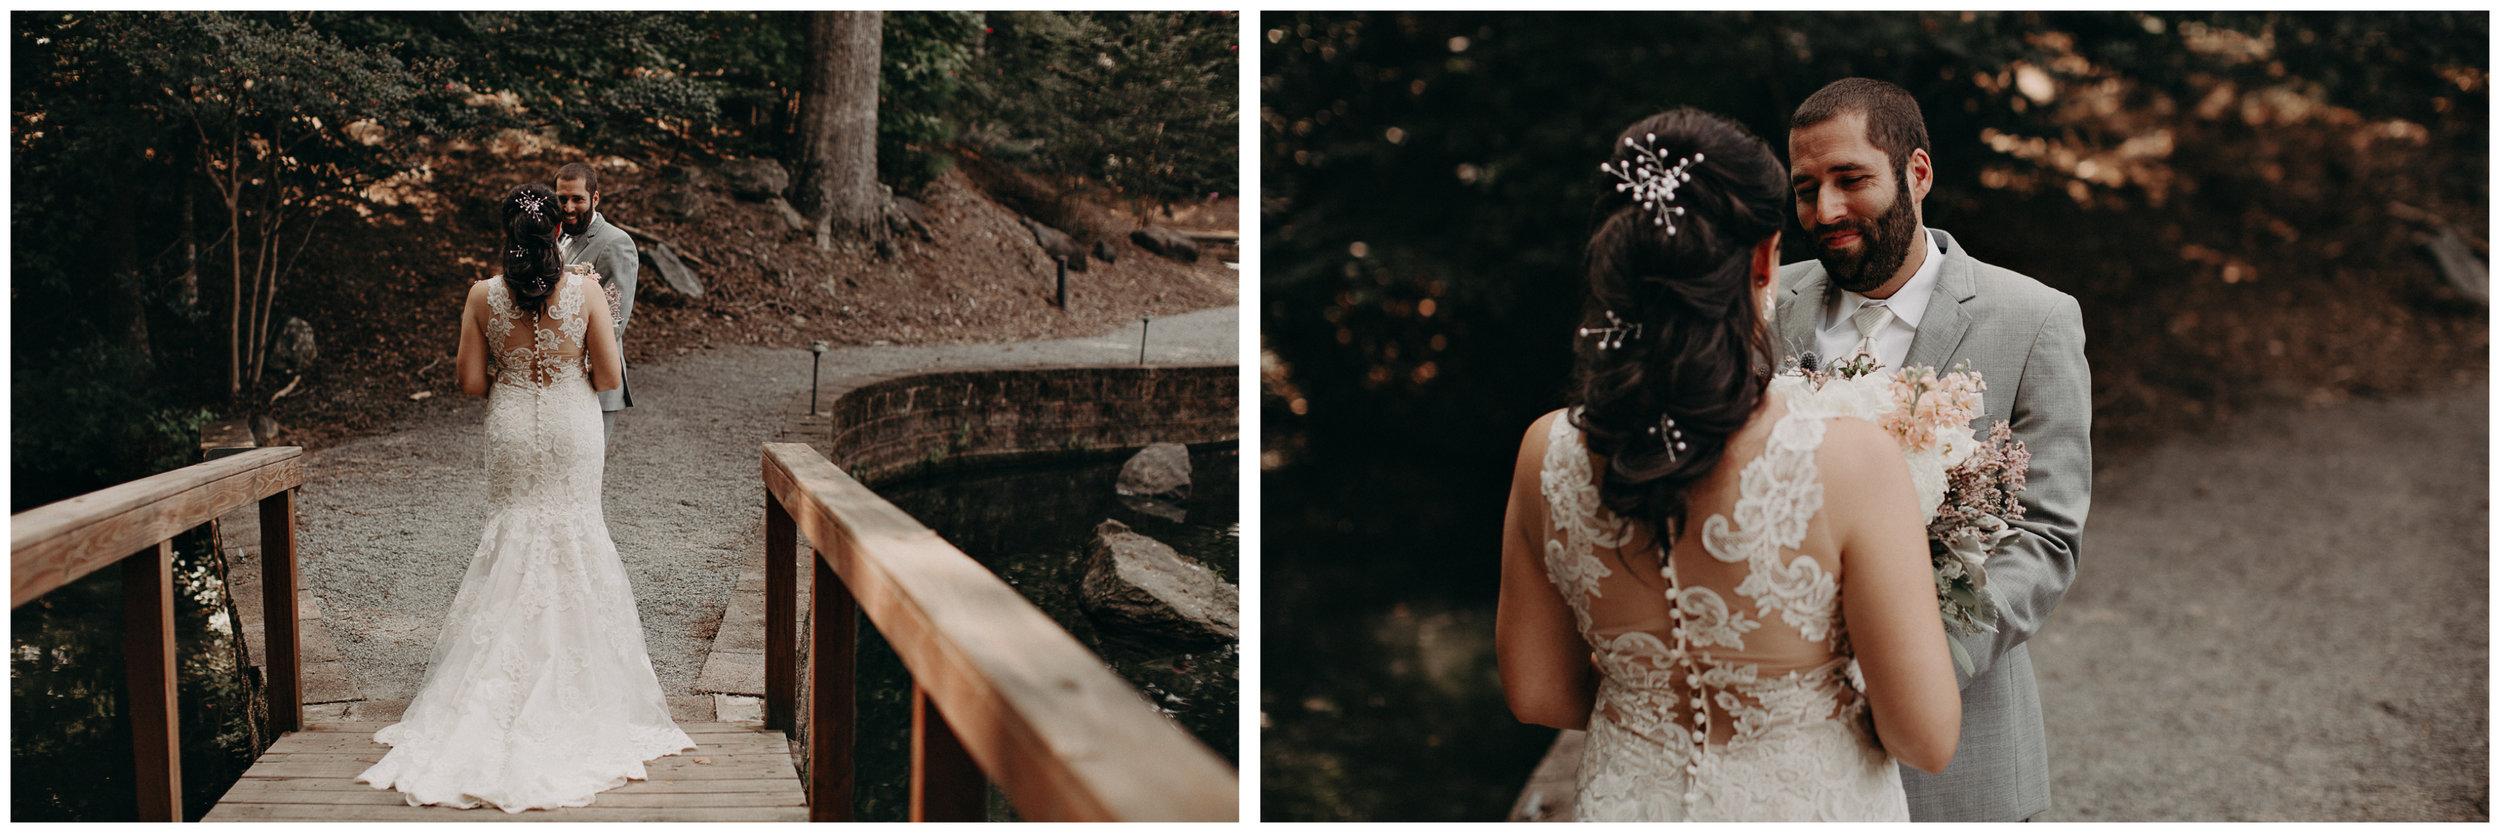 24  first look wedding day atlanta-ga .jpg